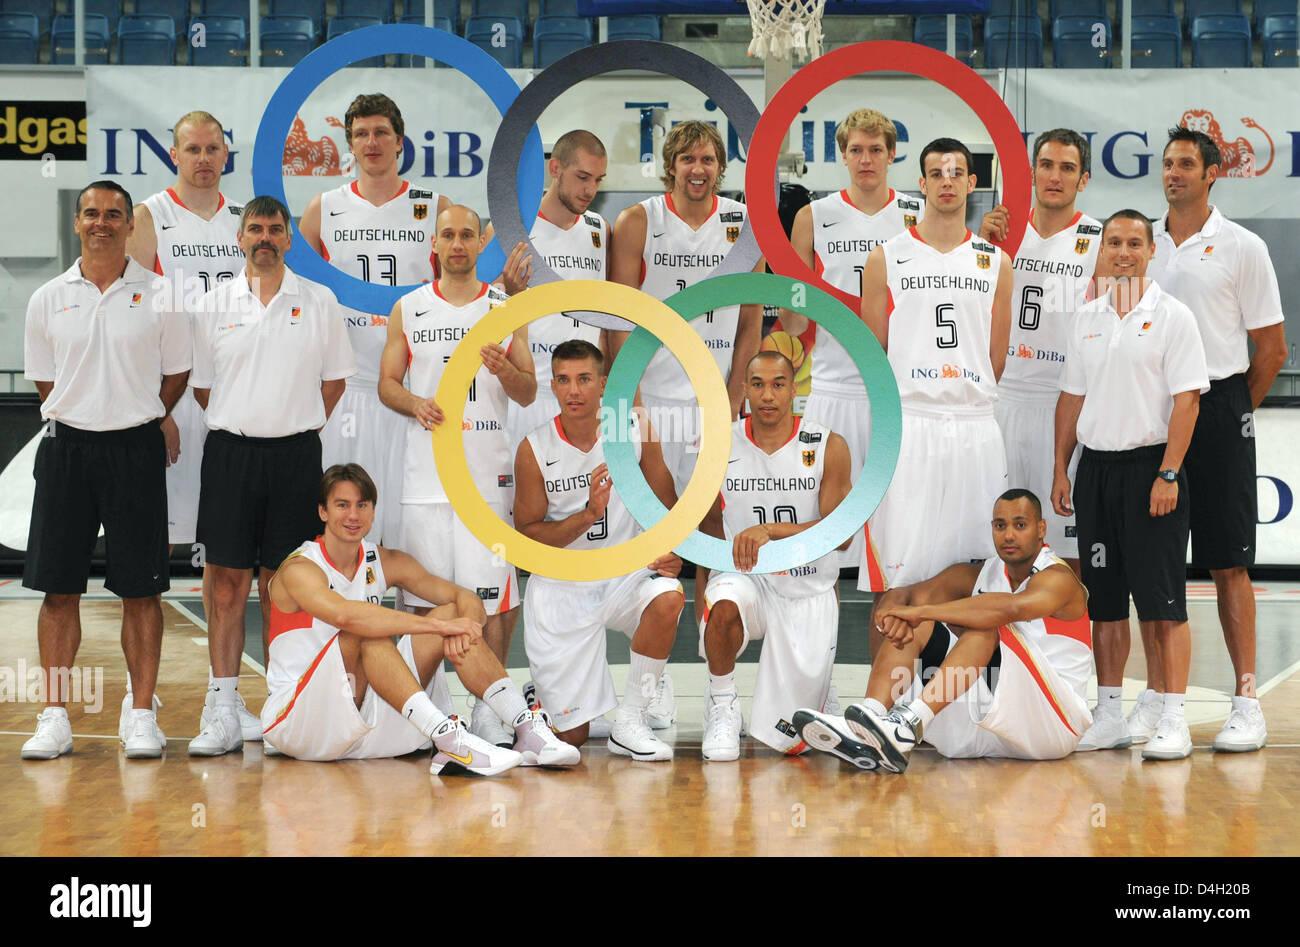 The German Olympic basketball squad back row L R Chris Kaman